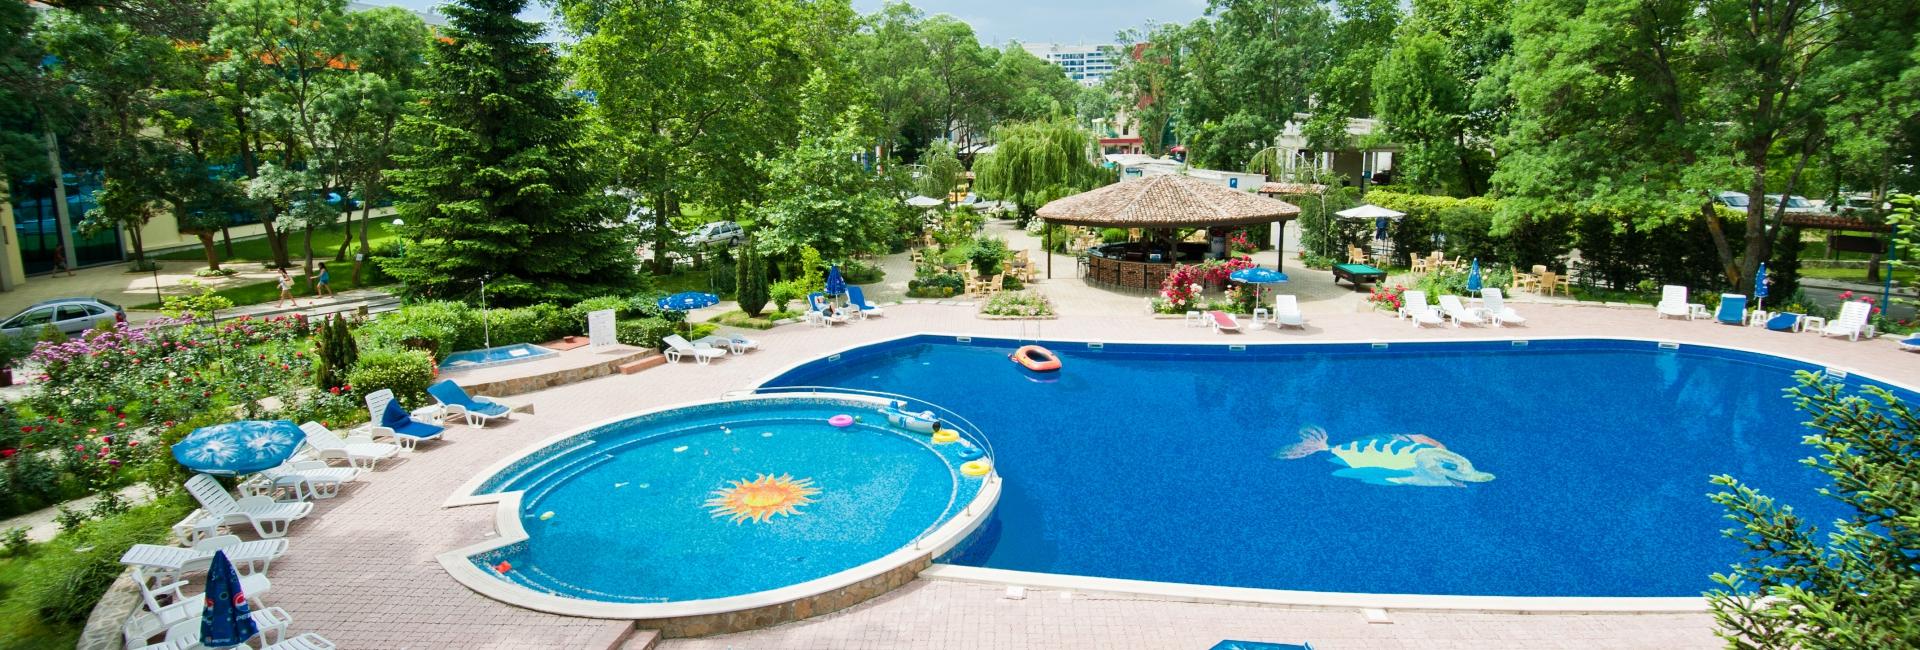 Home regina hotel sunny beach bulgaria - Sunny beach pools ...